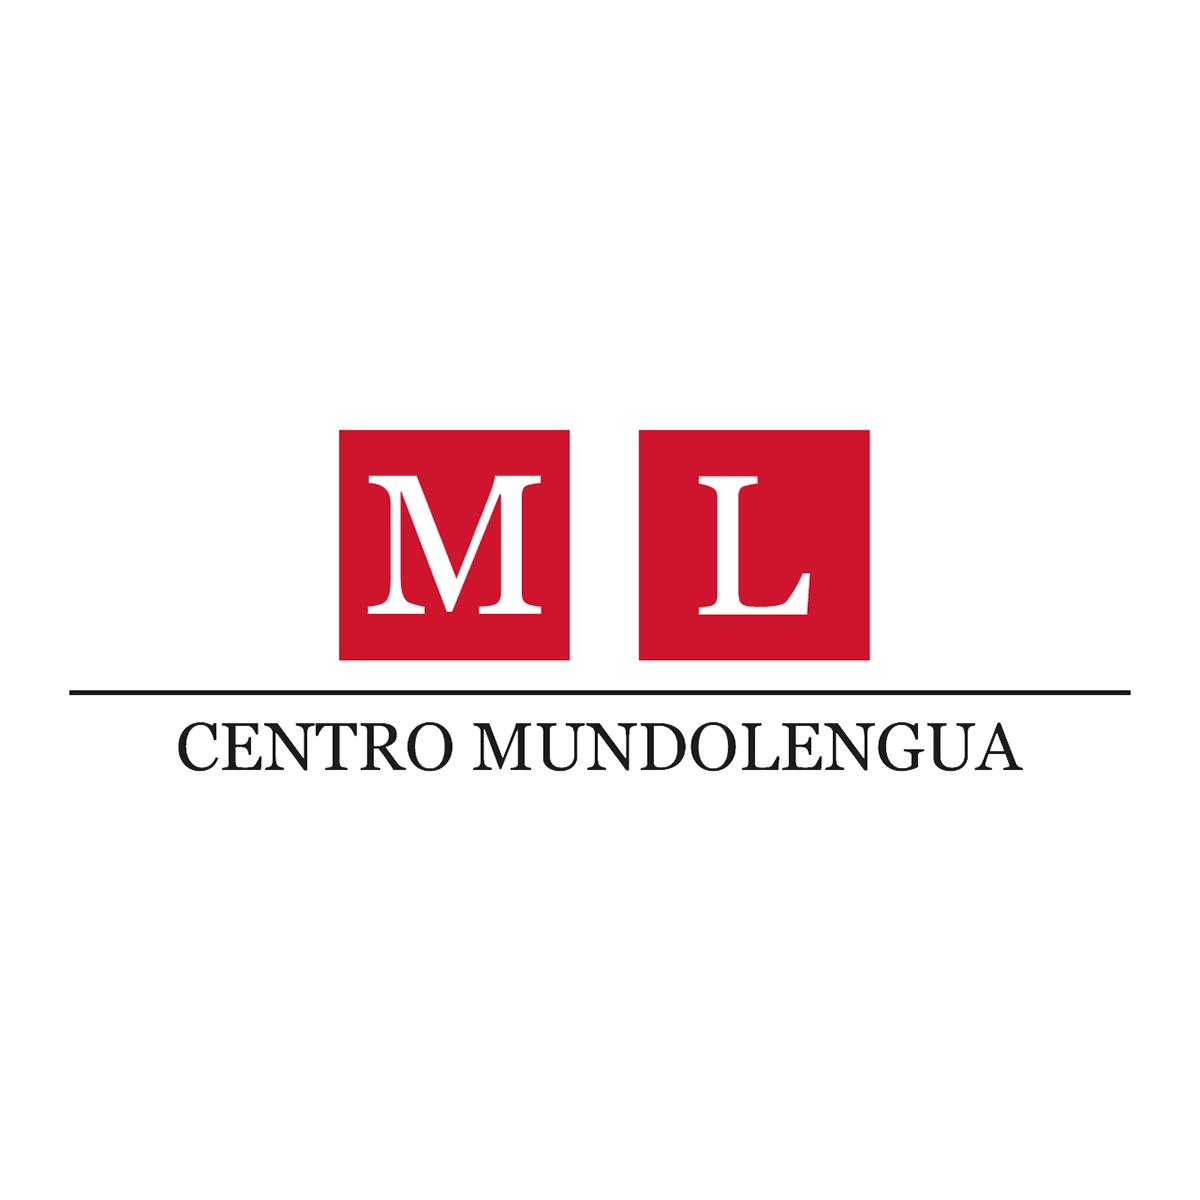 Centro MundoLengua:  Volunteer abroad program for high school students in Cadiz, Spain